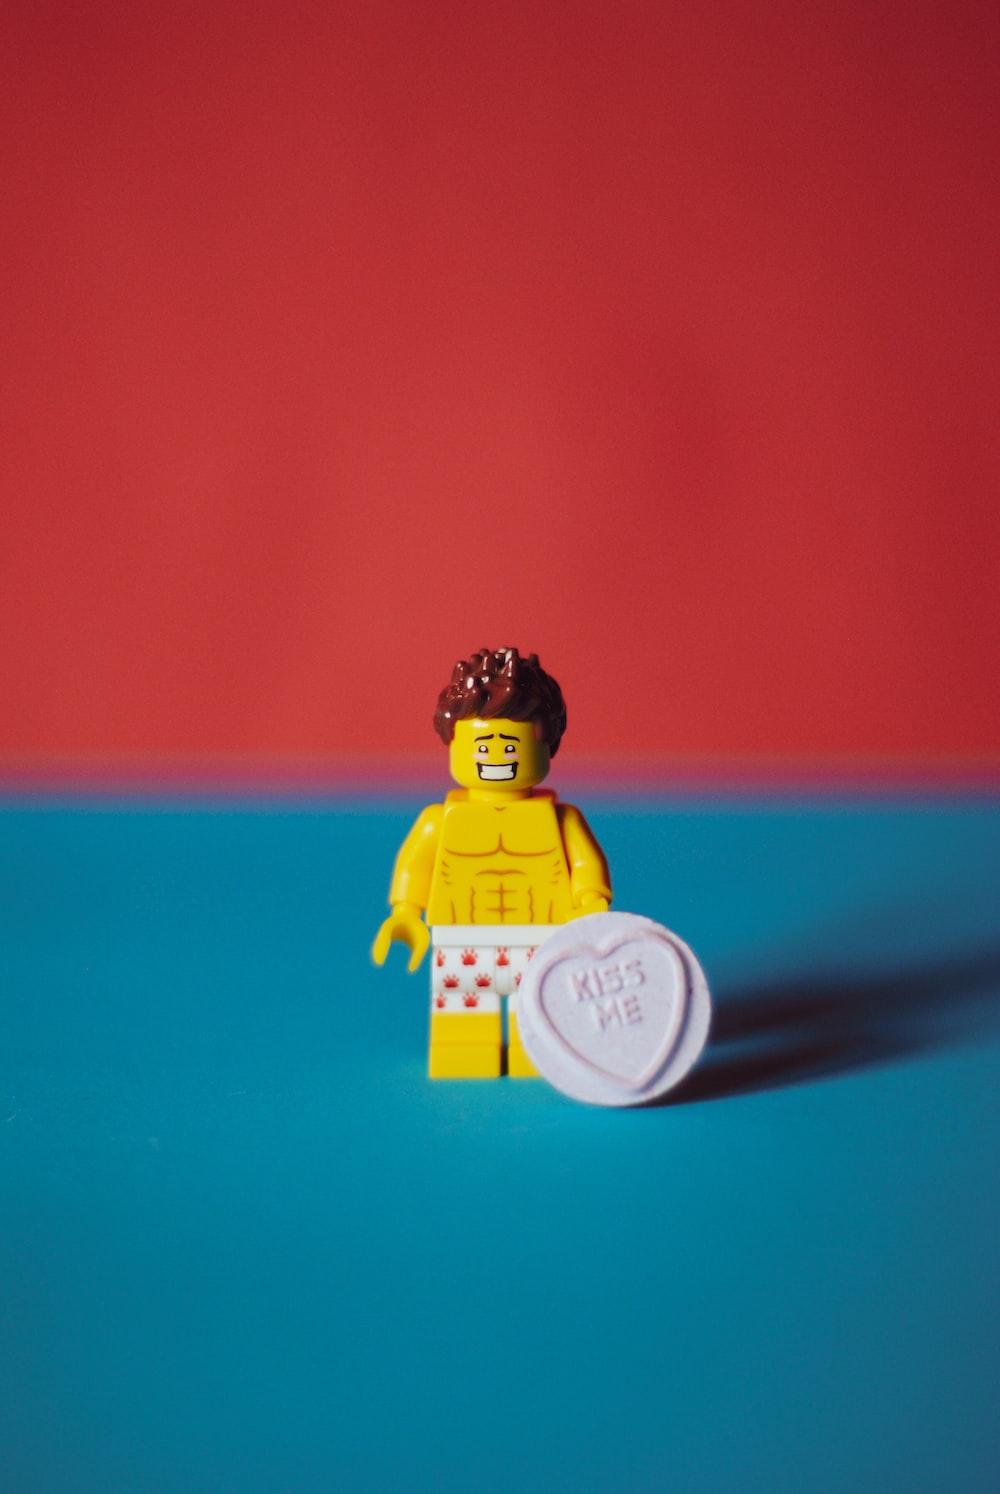 yellow and black lego mini figure